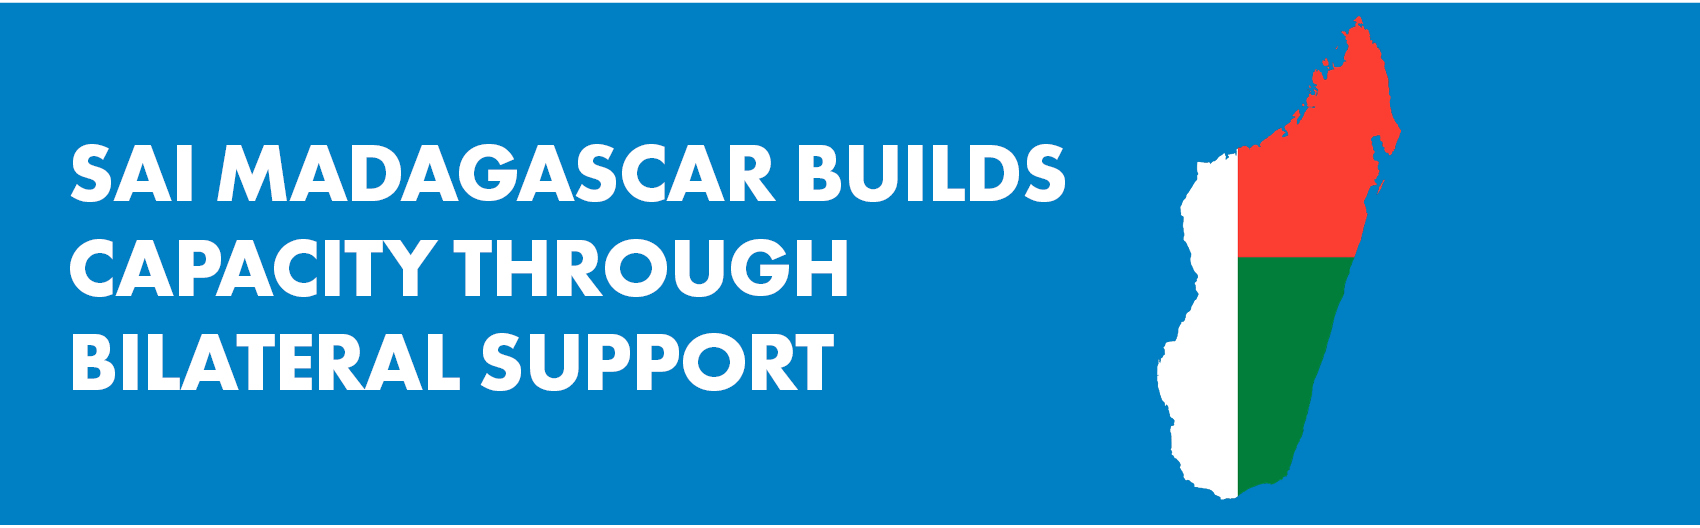 SAI Madagascar Builds Capacity through Bilateral Support